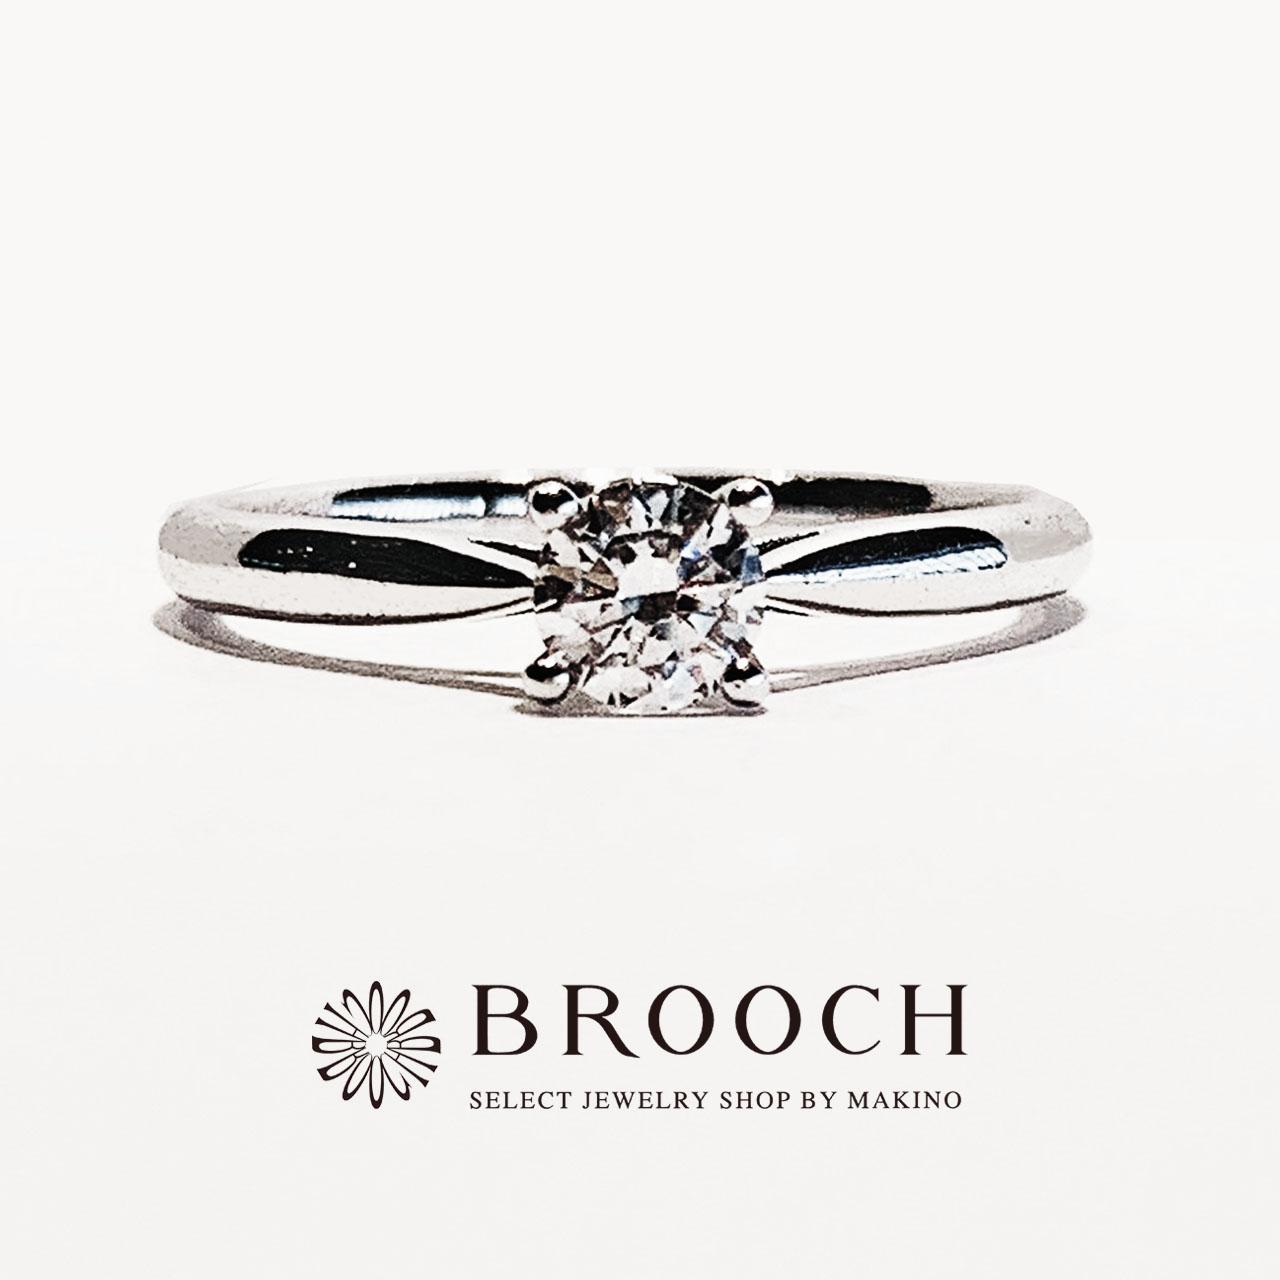 BROOCH 婚約指輪 エンゲージリング かわいい シンプル1石デザイン